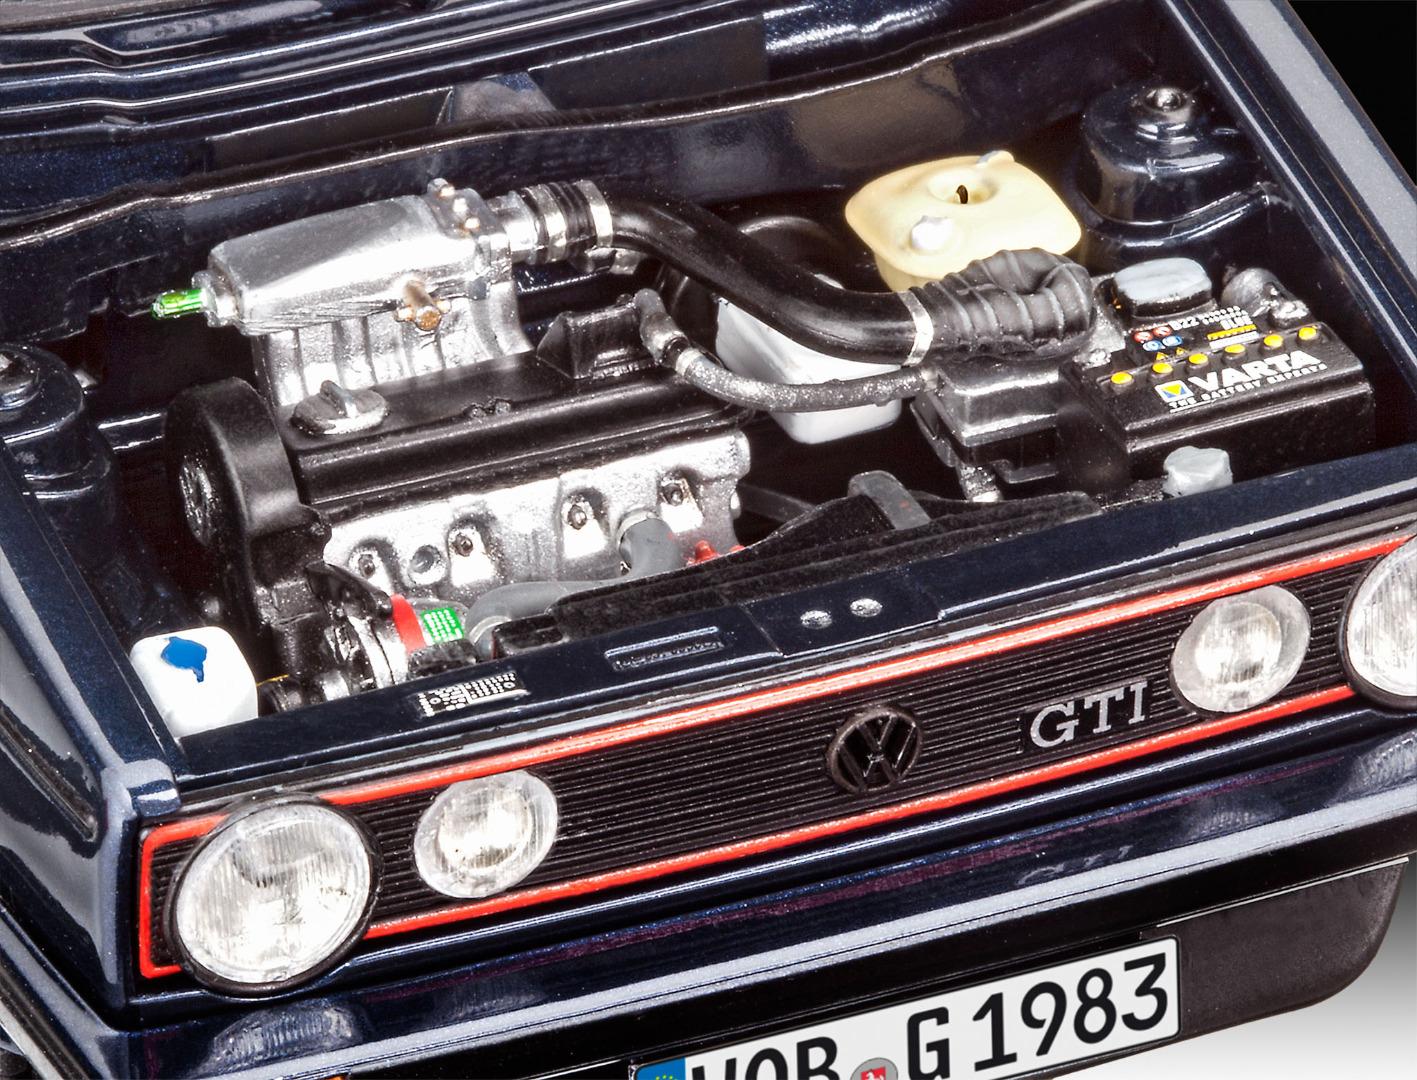 Revell Model Gift Set 35 Years VW Golf 1 GTI Pirelli Scale 1:24